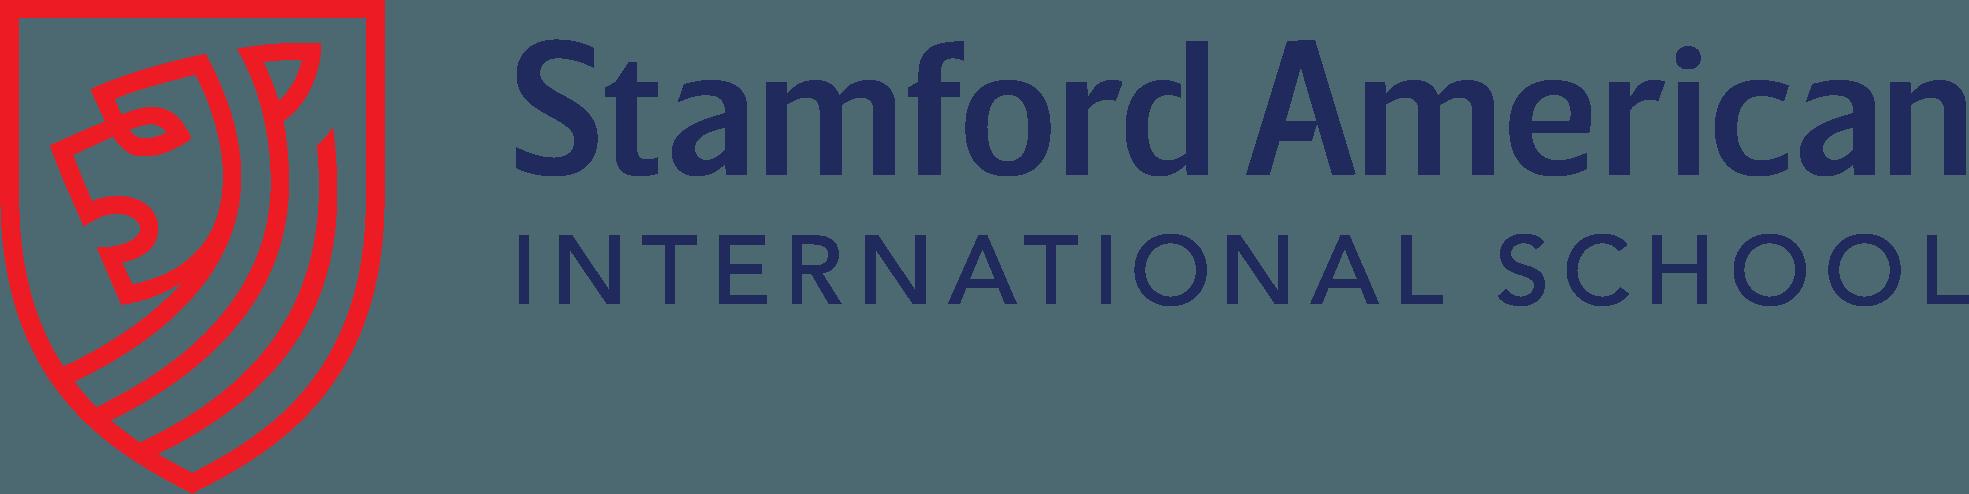 STAMFORD AMERICAN INTERNATIONAL SCHOOL LOGO